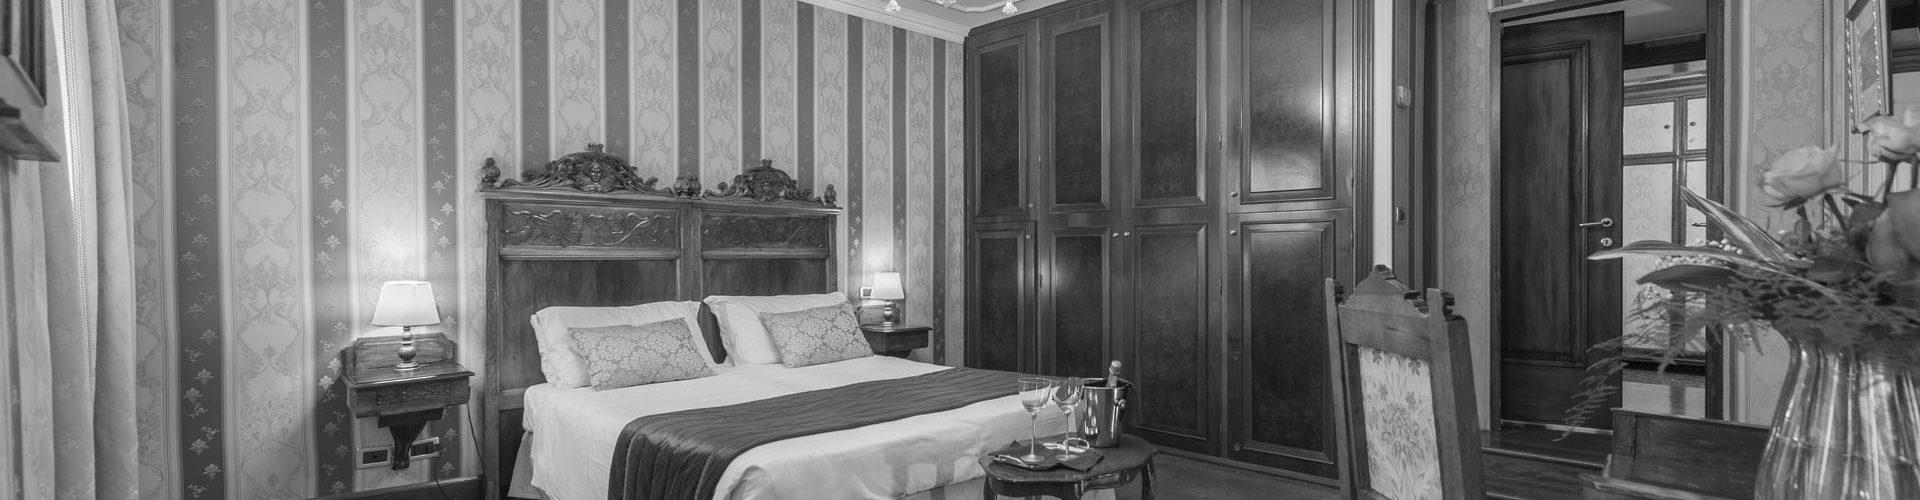 palazzo-bembo-superior-room-2-bn